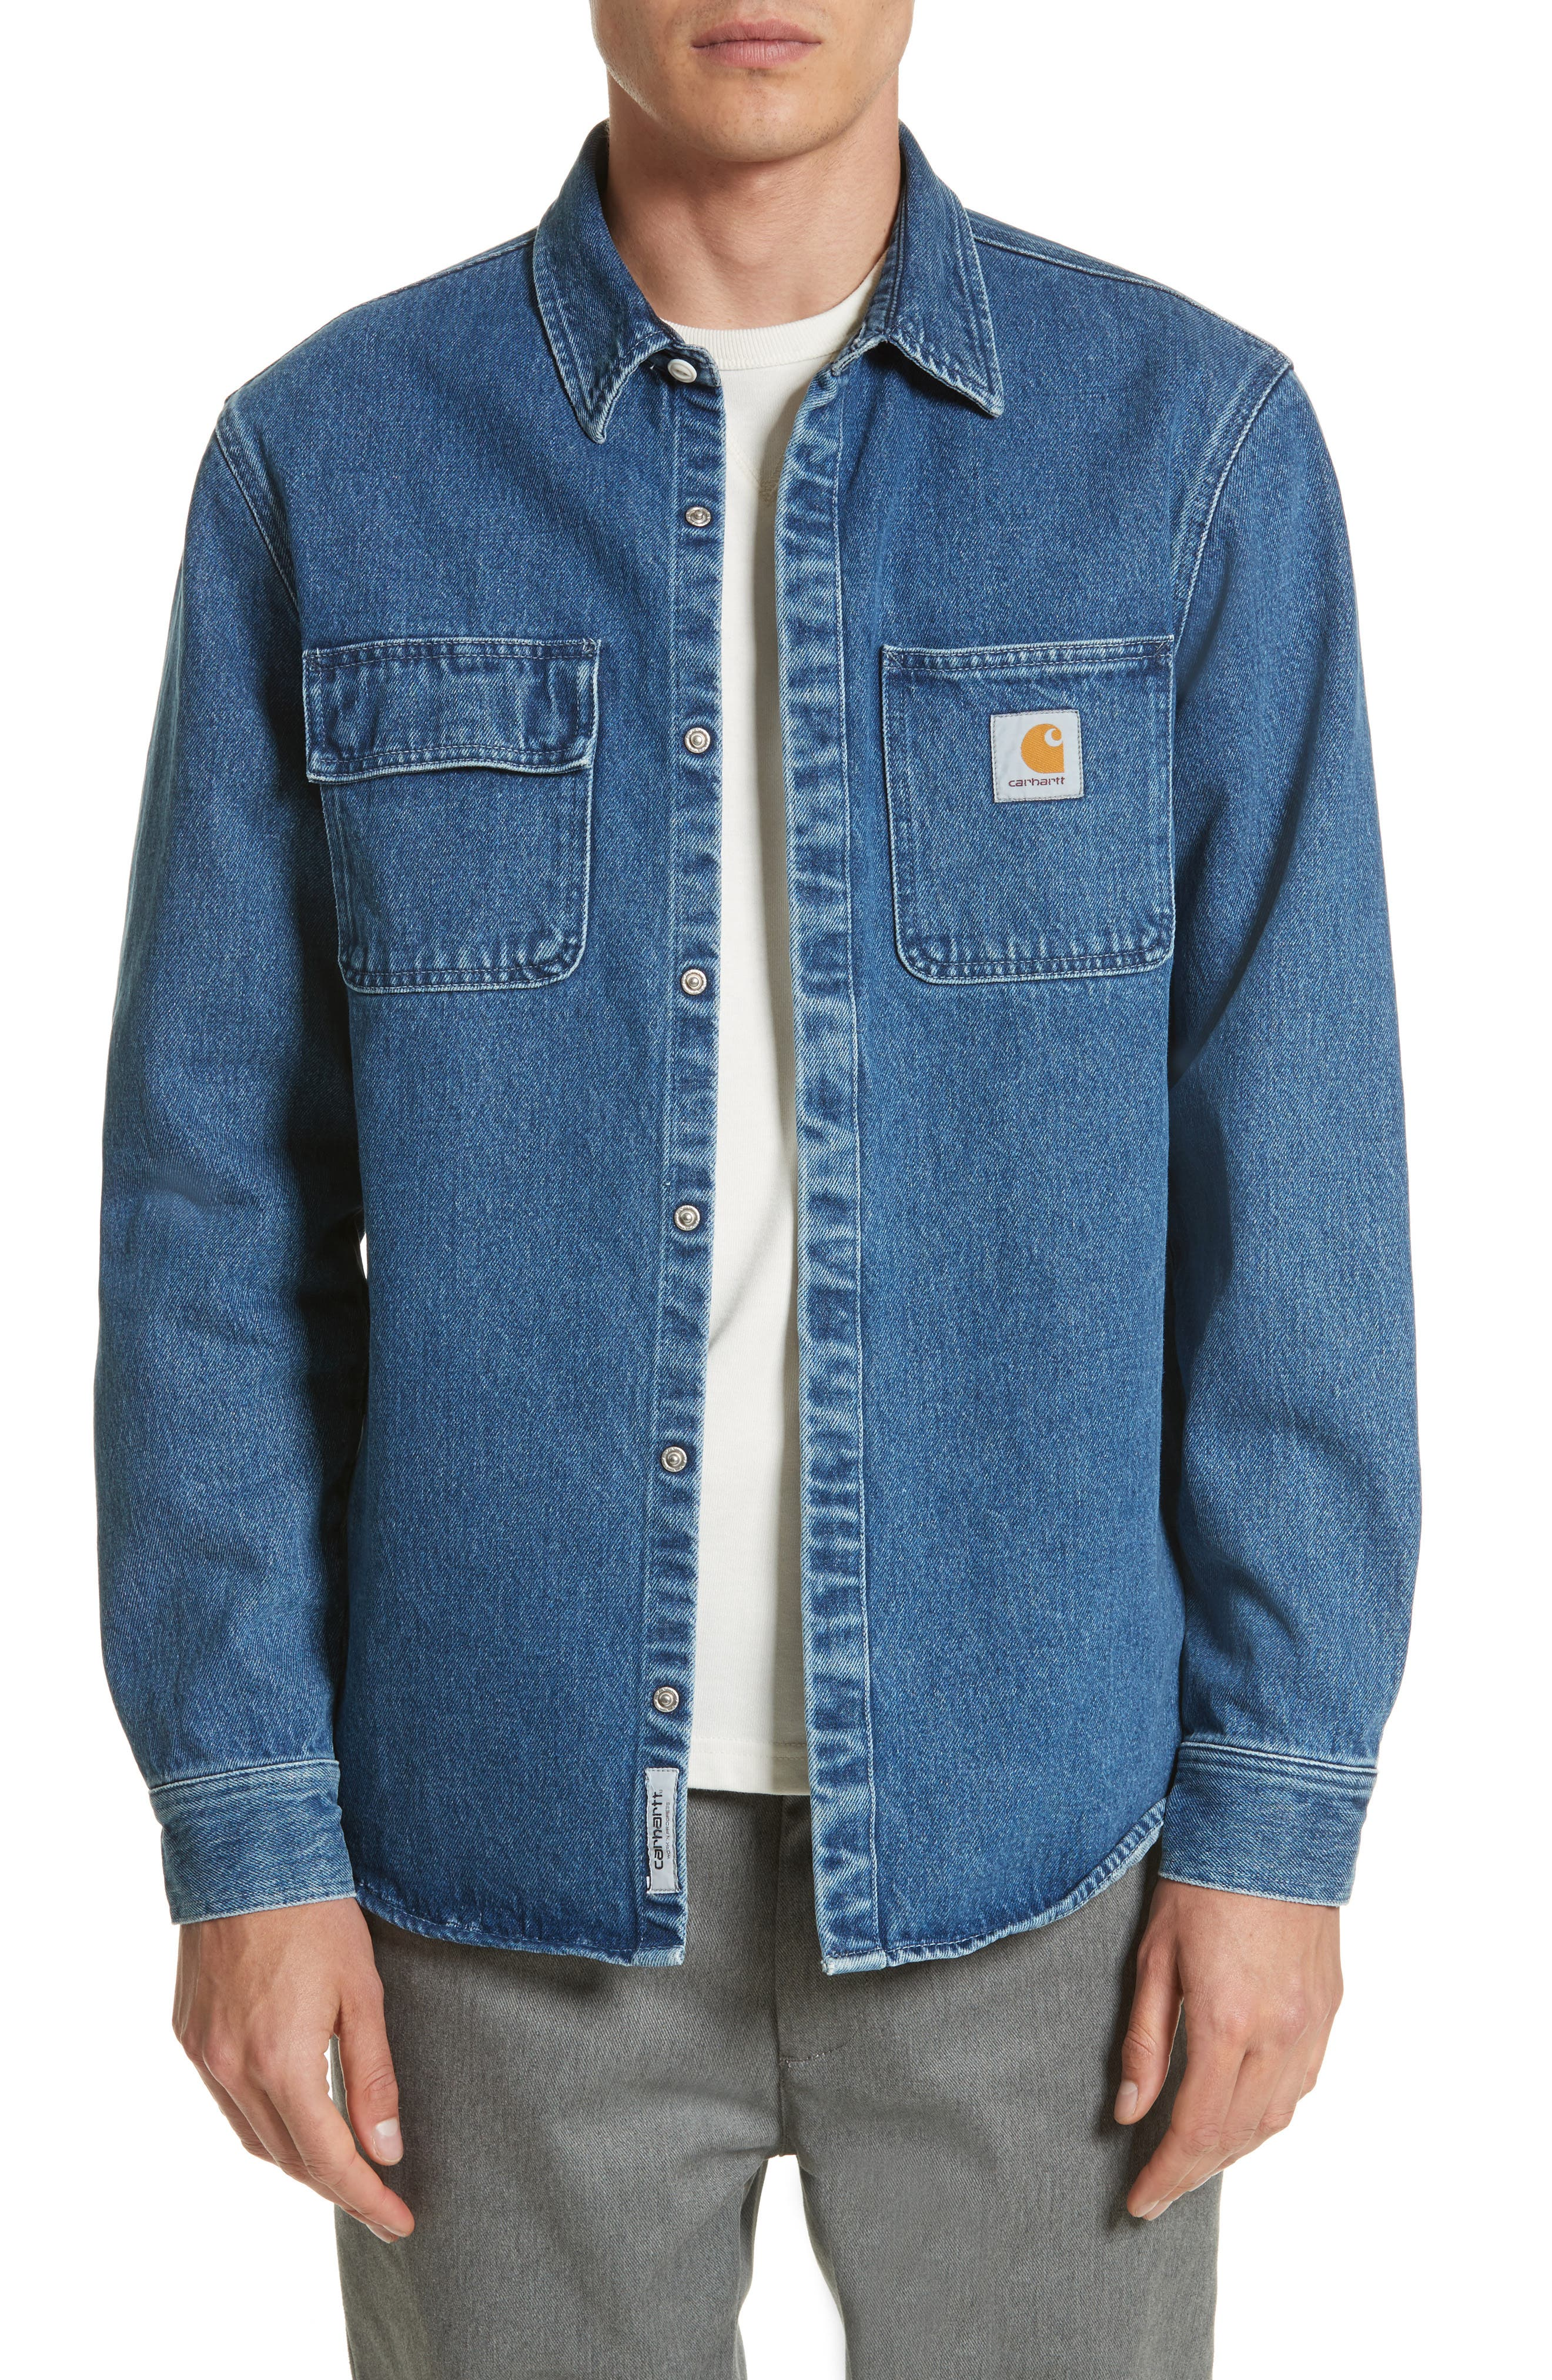 Carhartt Work in Progress Salinac Shirt Jacket